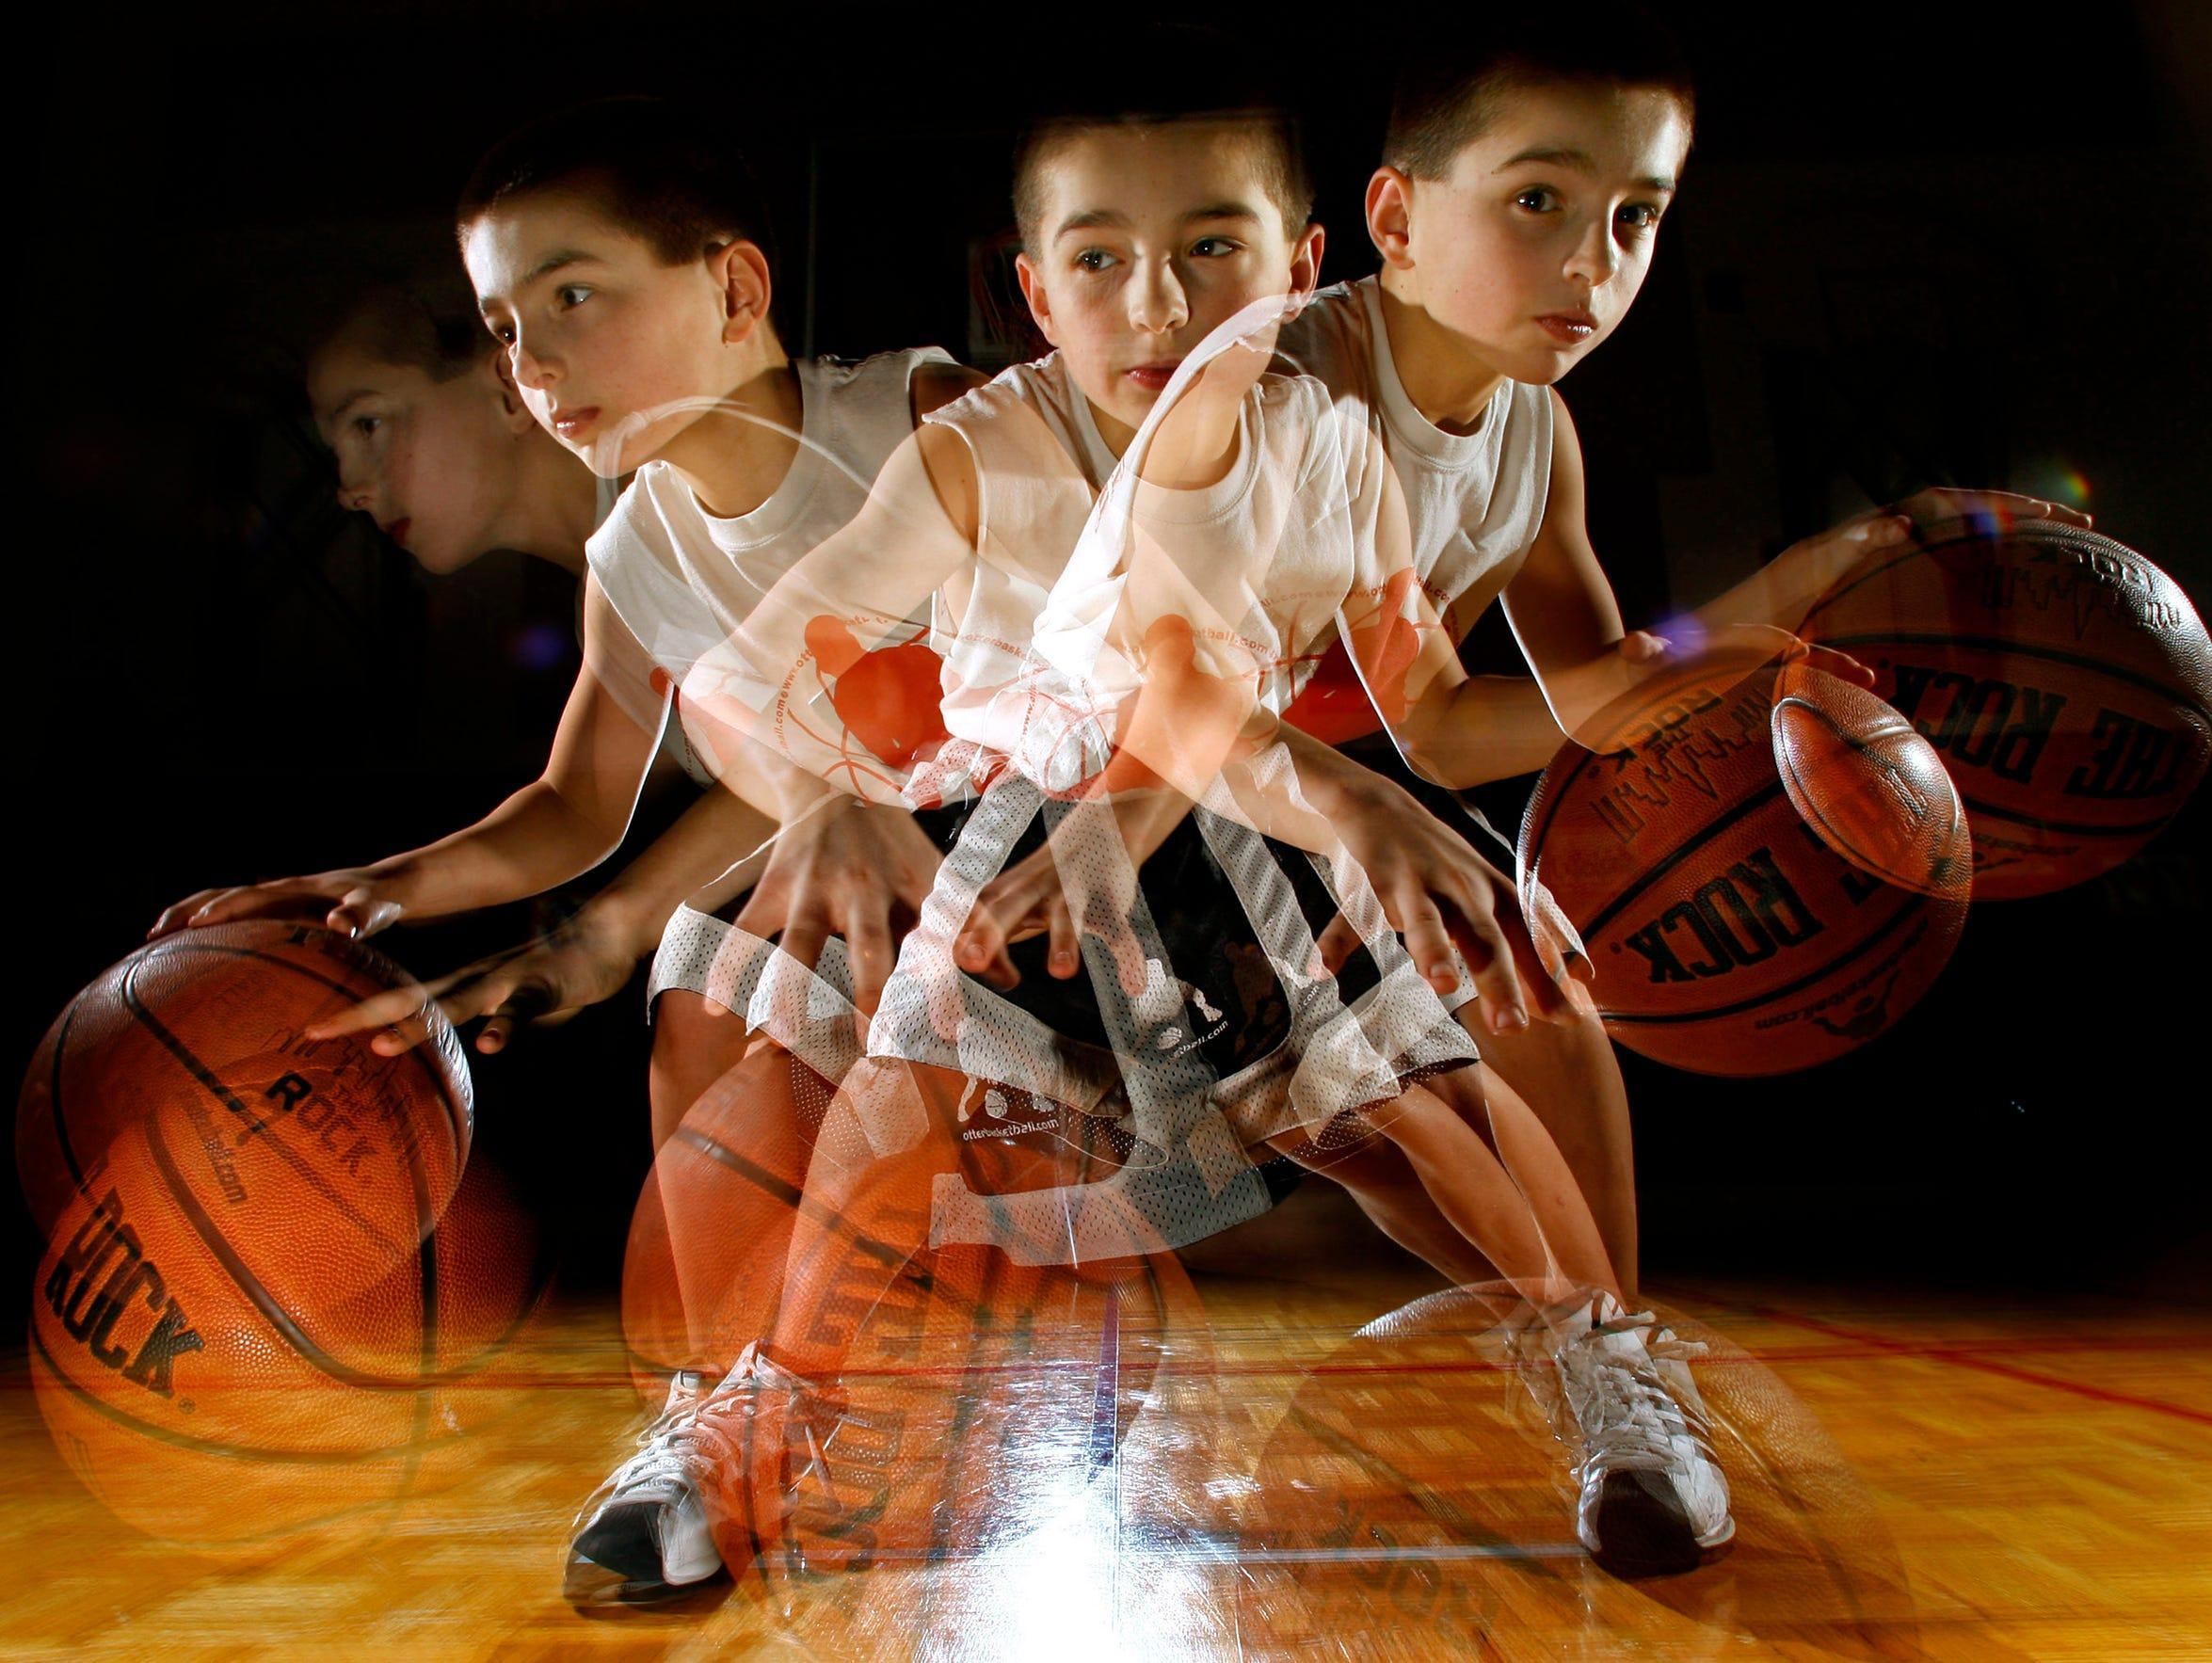 Jordan McCabe at 10 years old. The Kaukauna standout